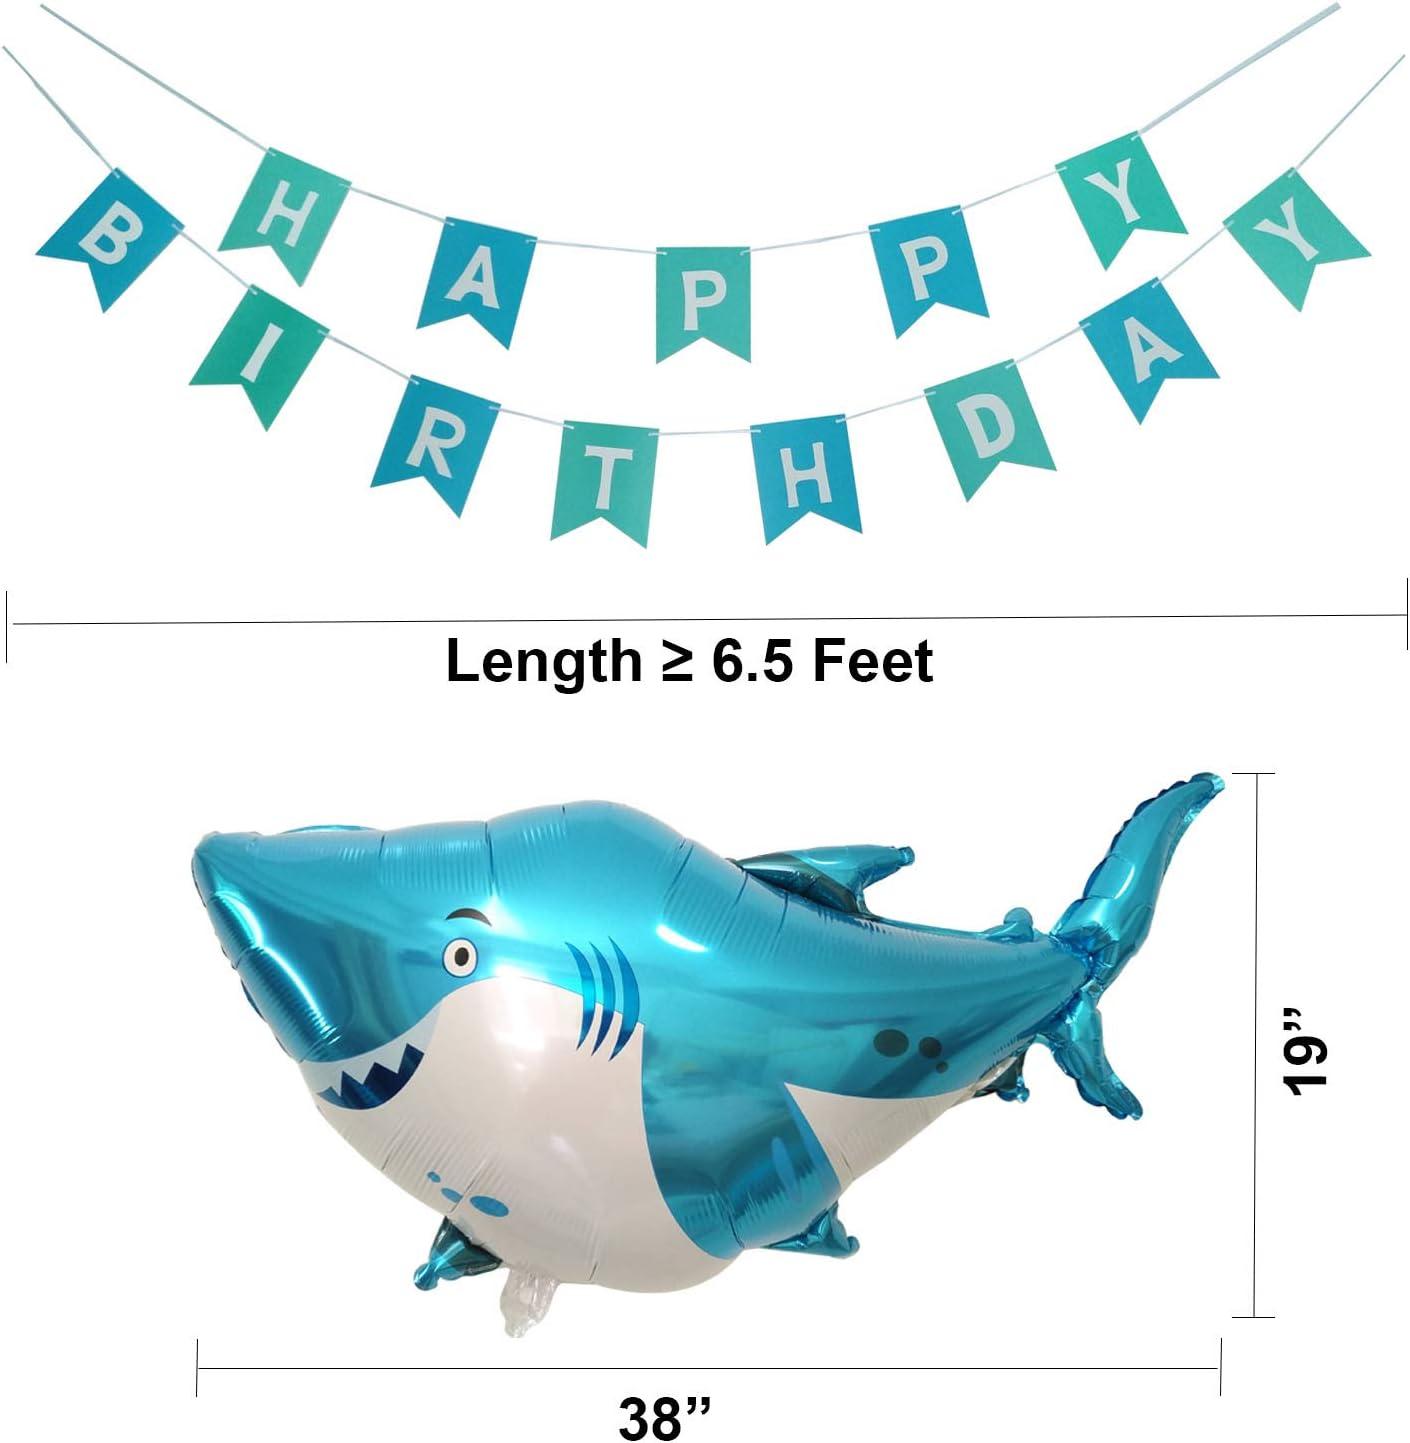 8 BALLOONS Latex Under the Sea Ocean Creatures Birthday Party Unisex Fish Colour